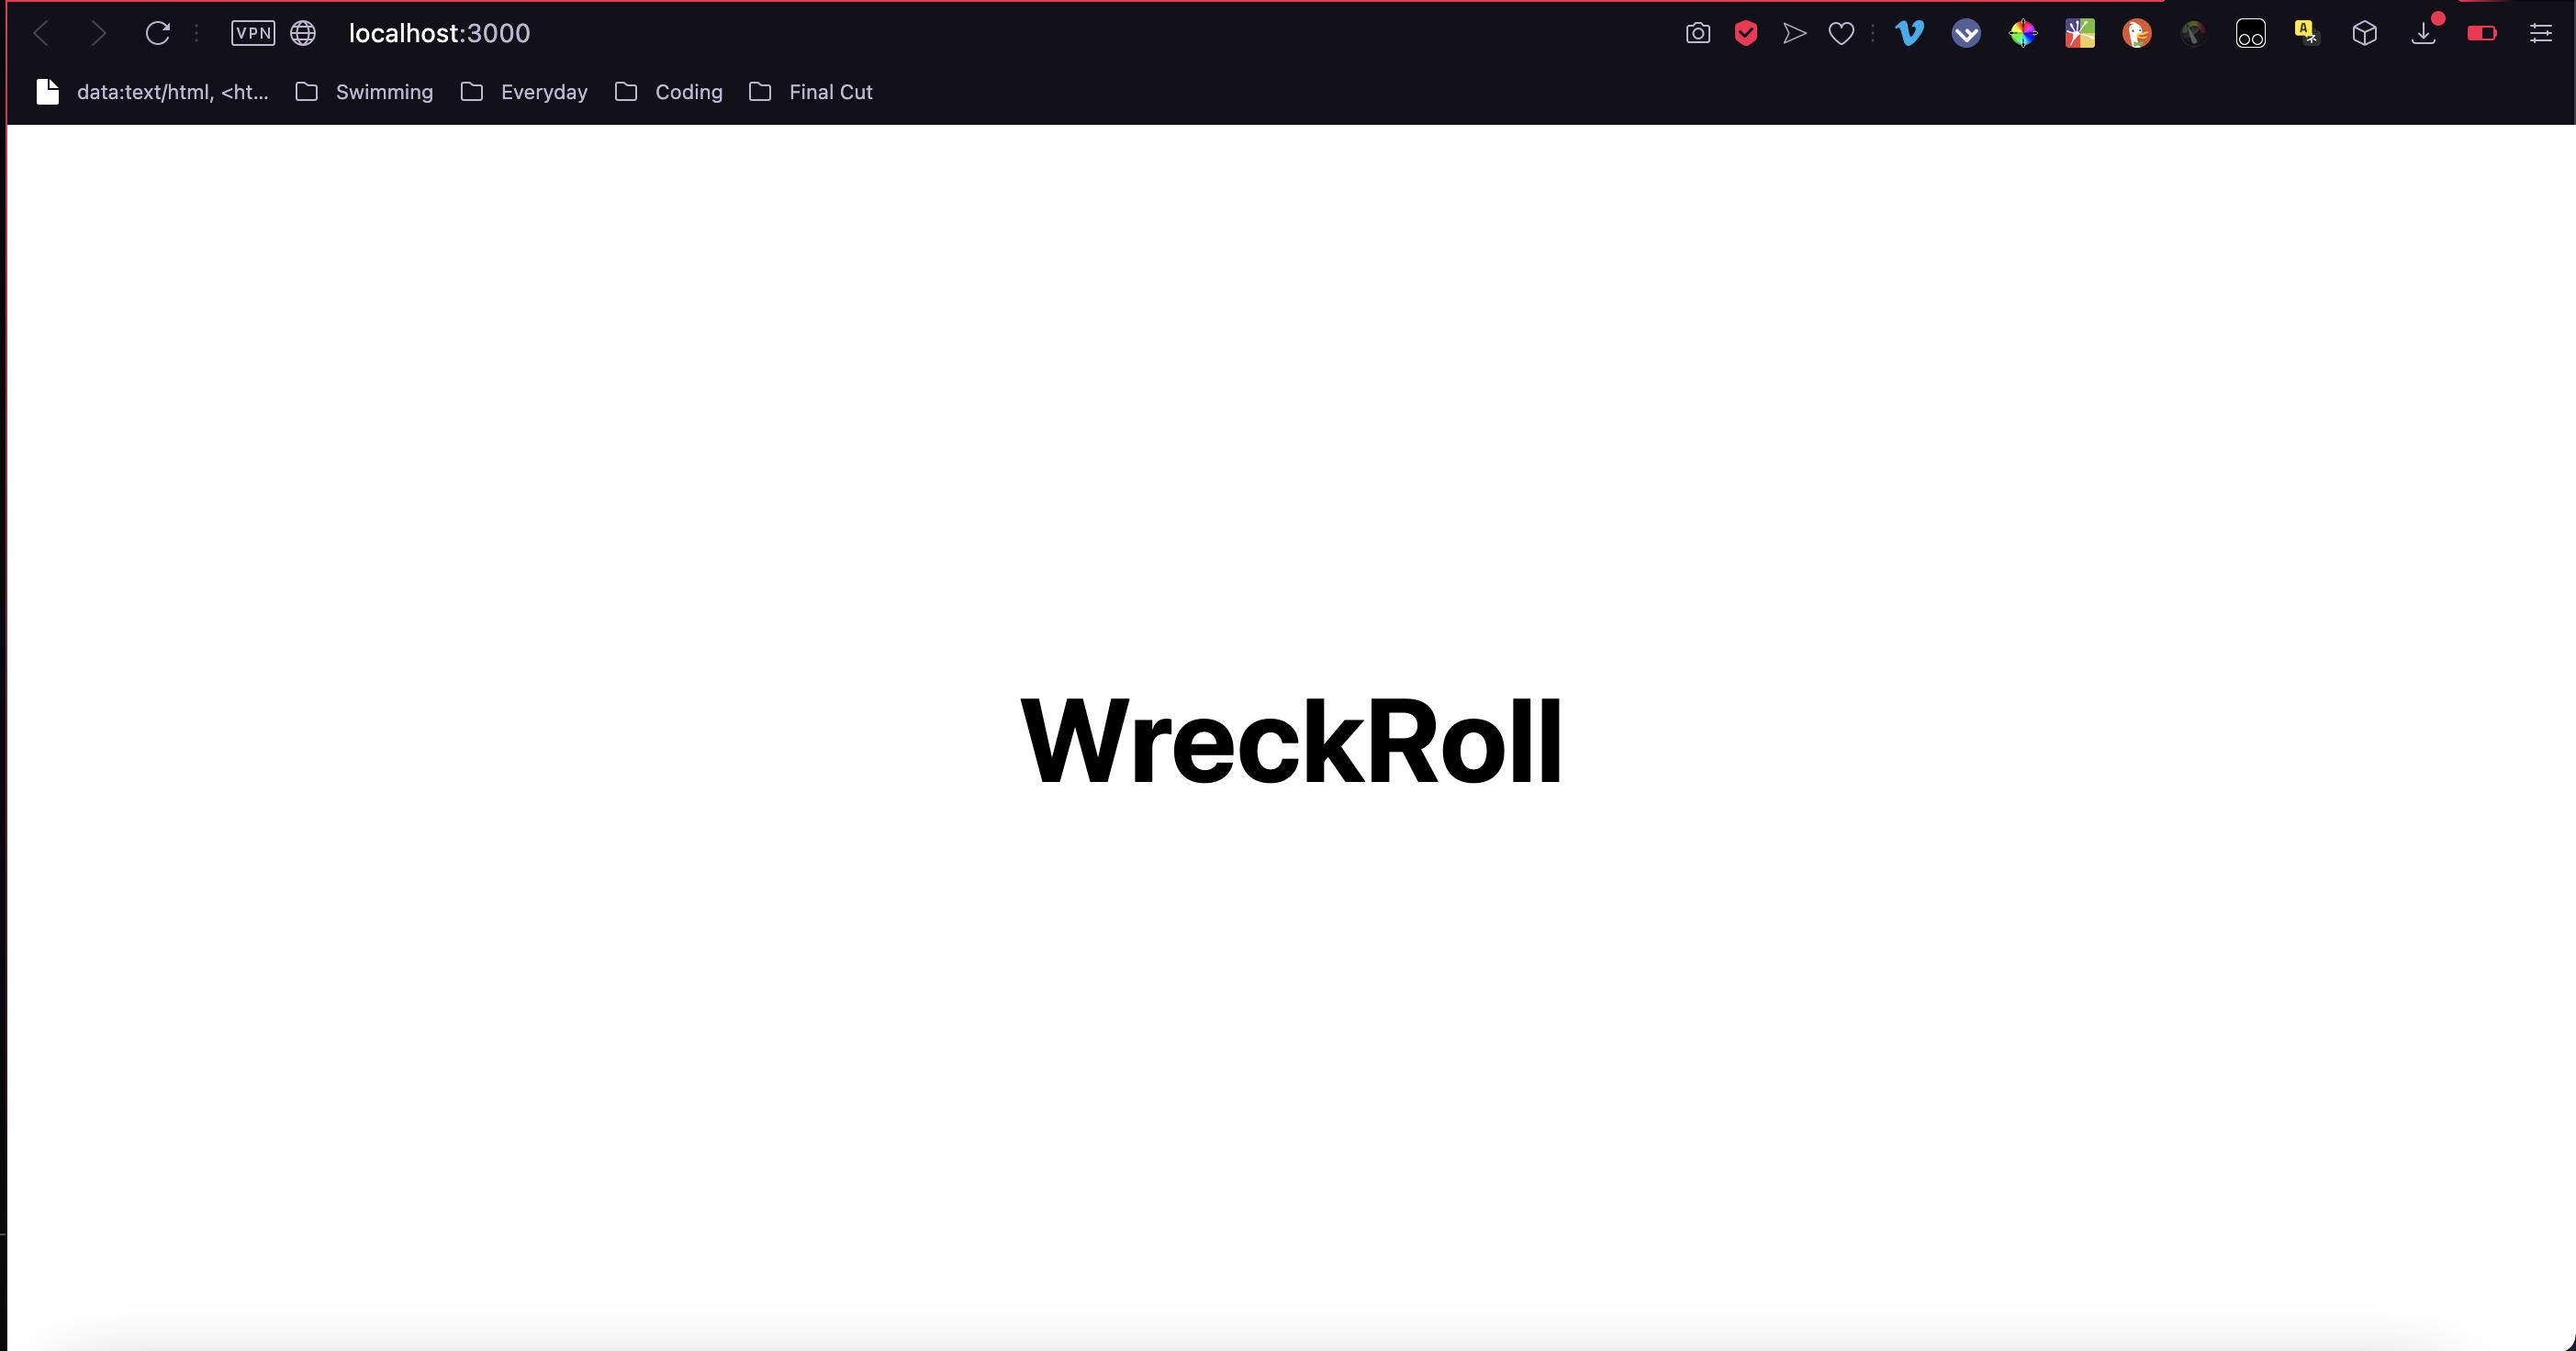 https://cloud-ccmvc1dej-hack-club-bot.vercel.app/0screen_shot_2021-08-09_at_3.12.04_pm.png